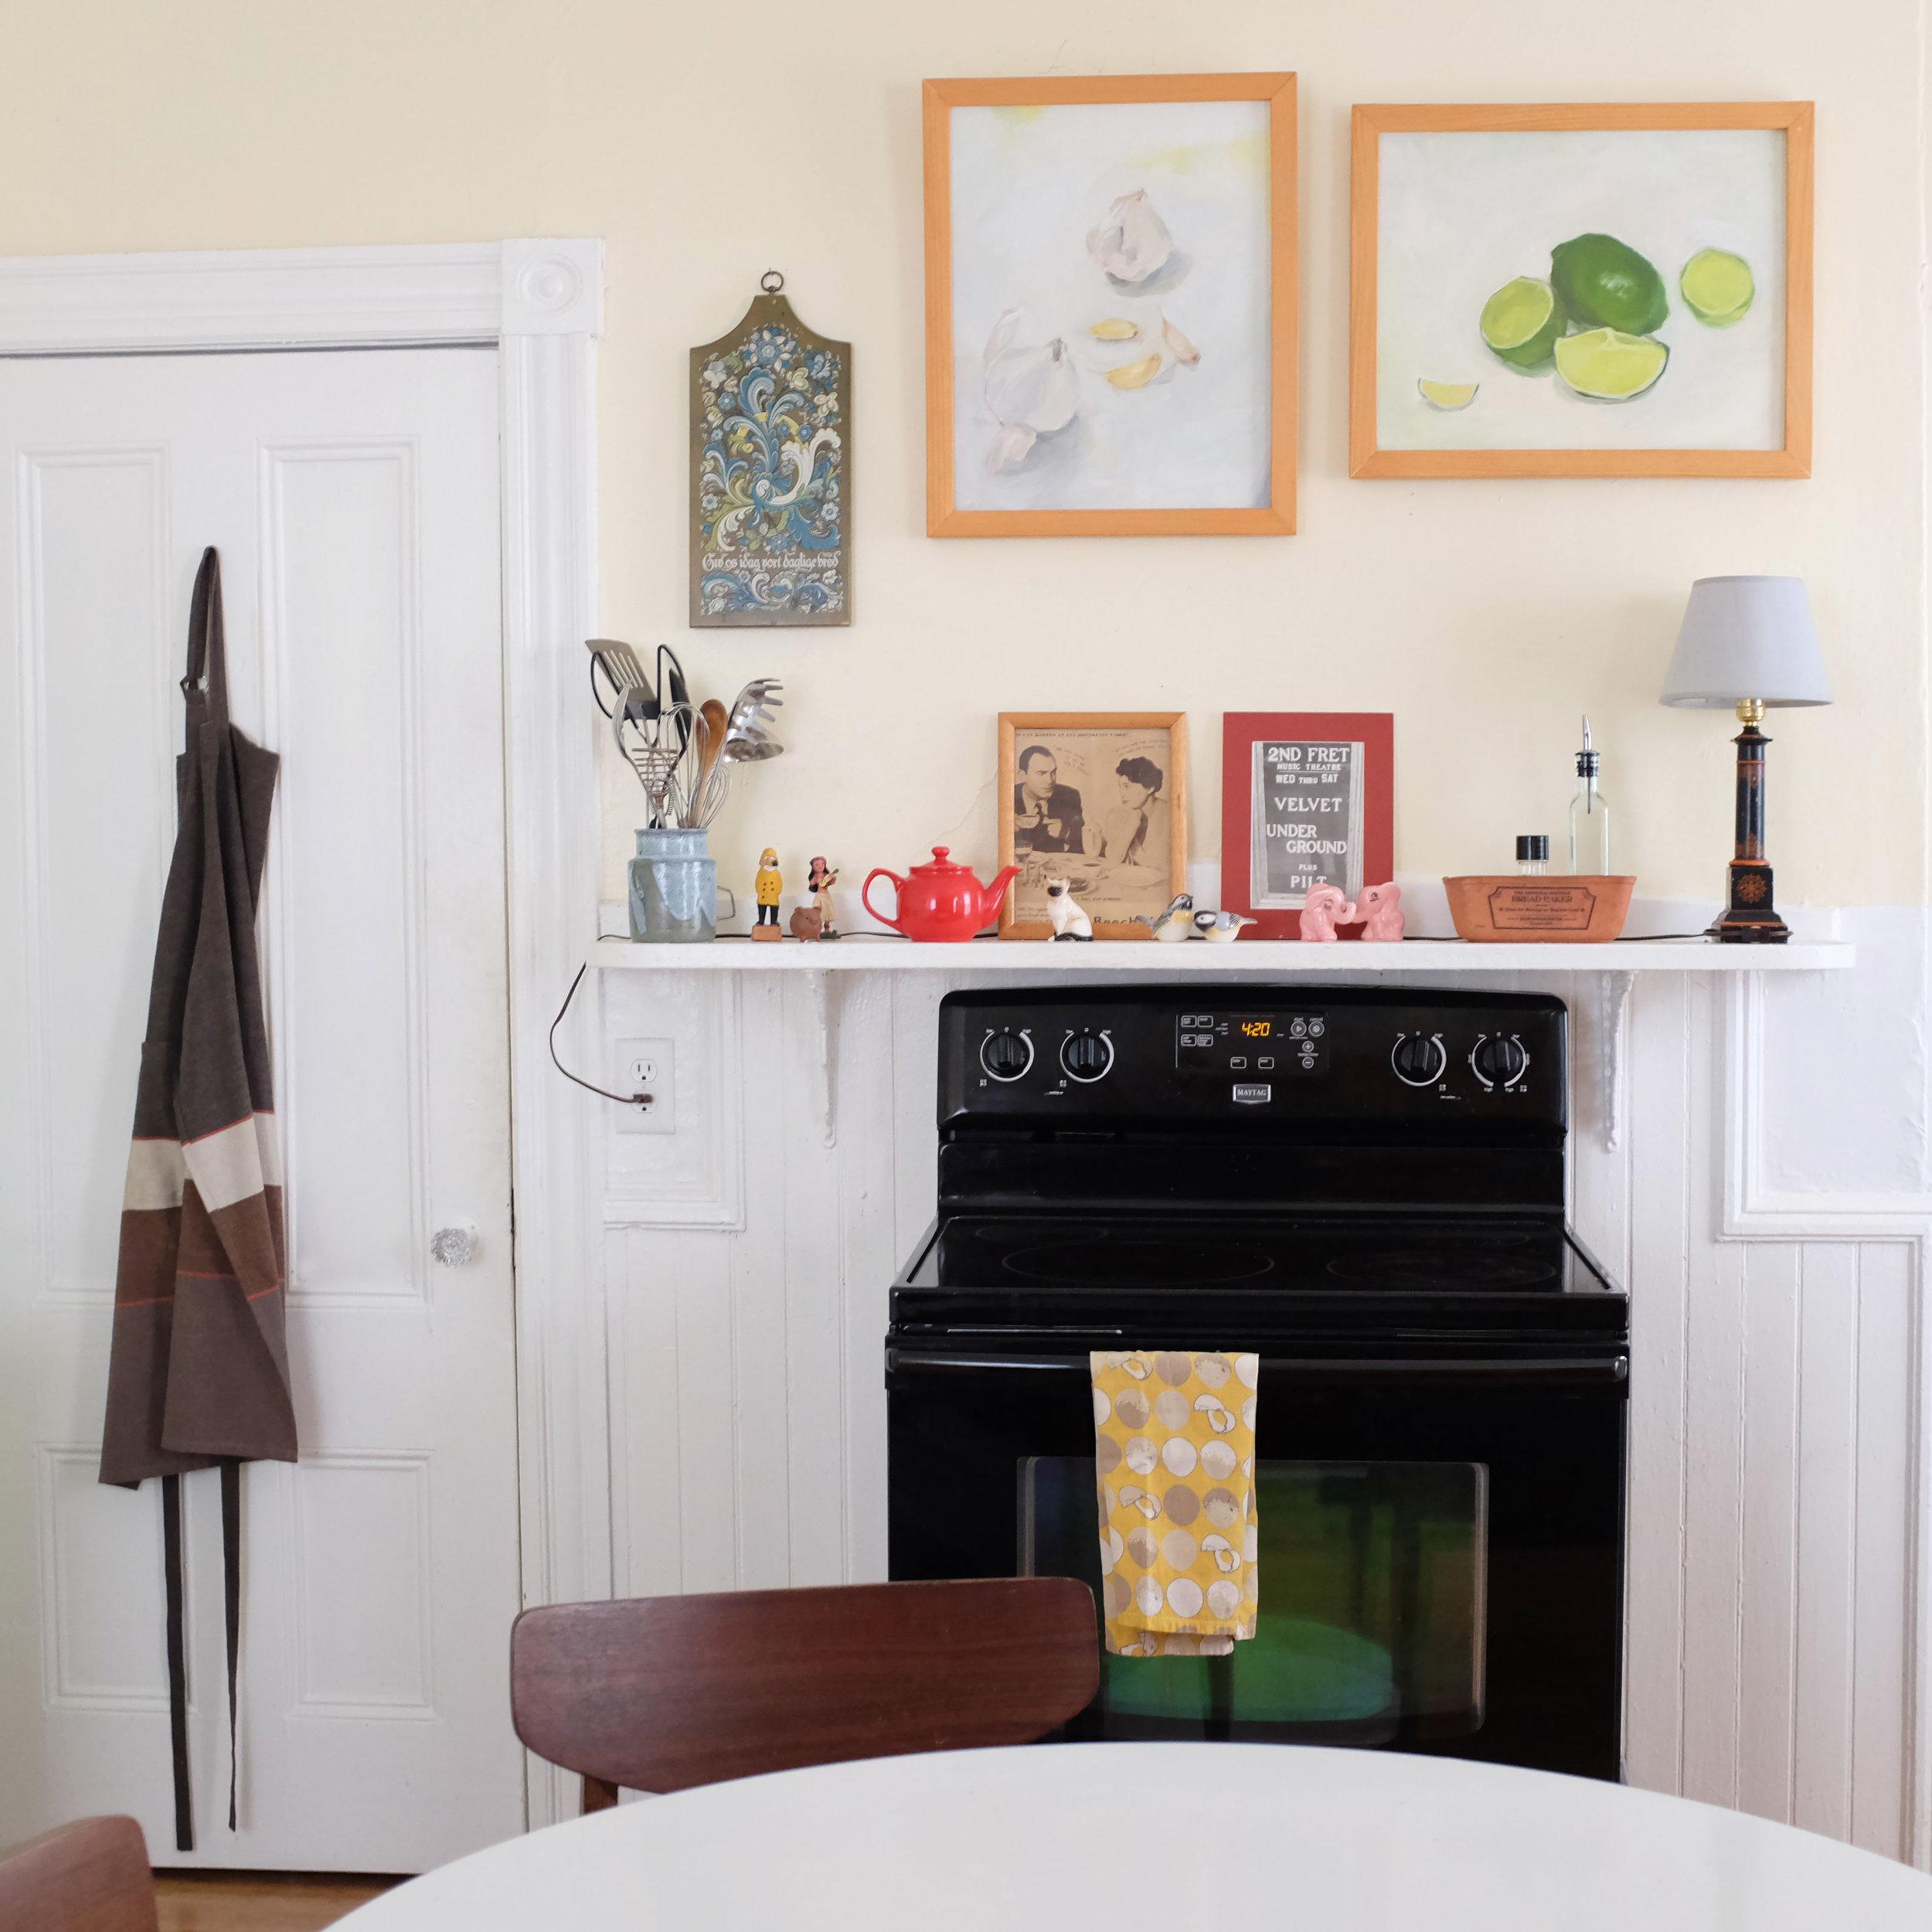 LinziClary_Apartment_14.JPG